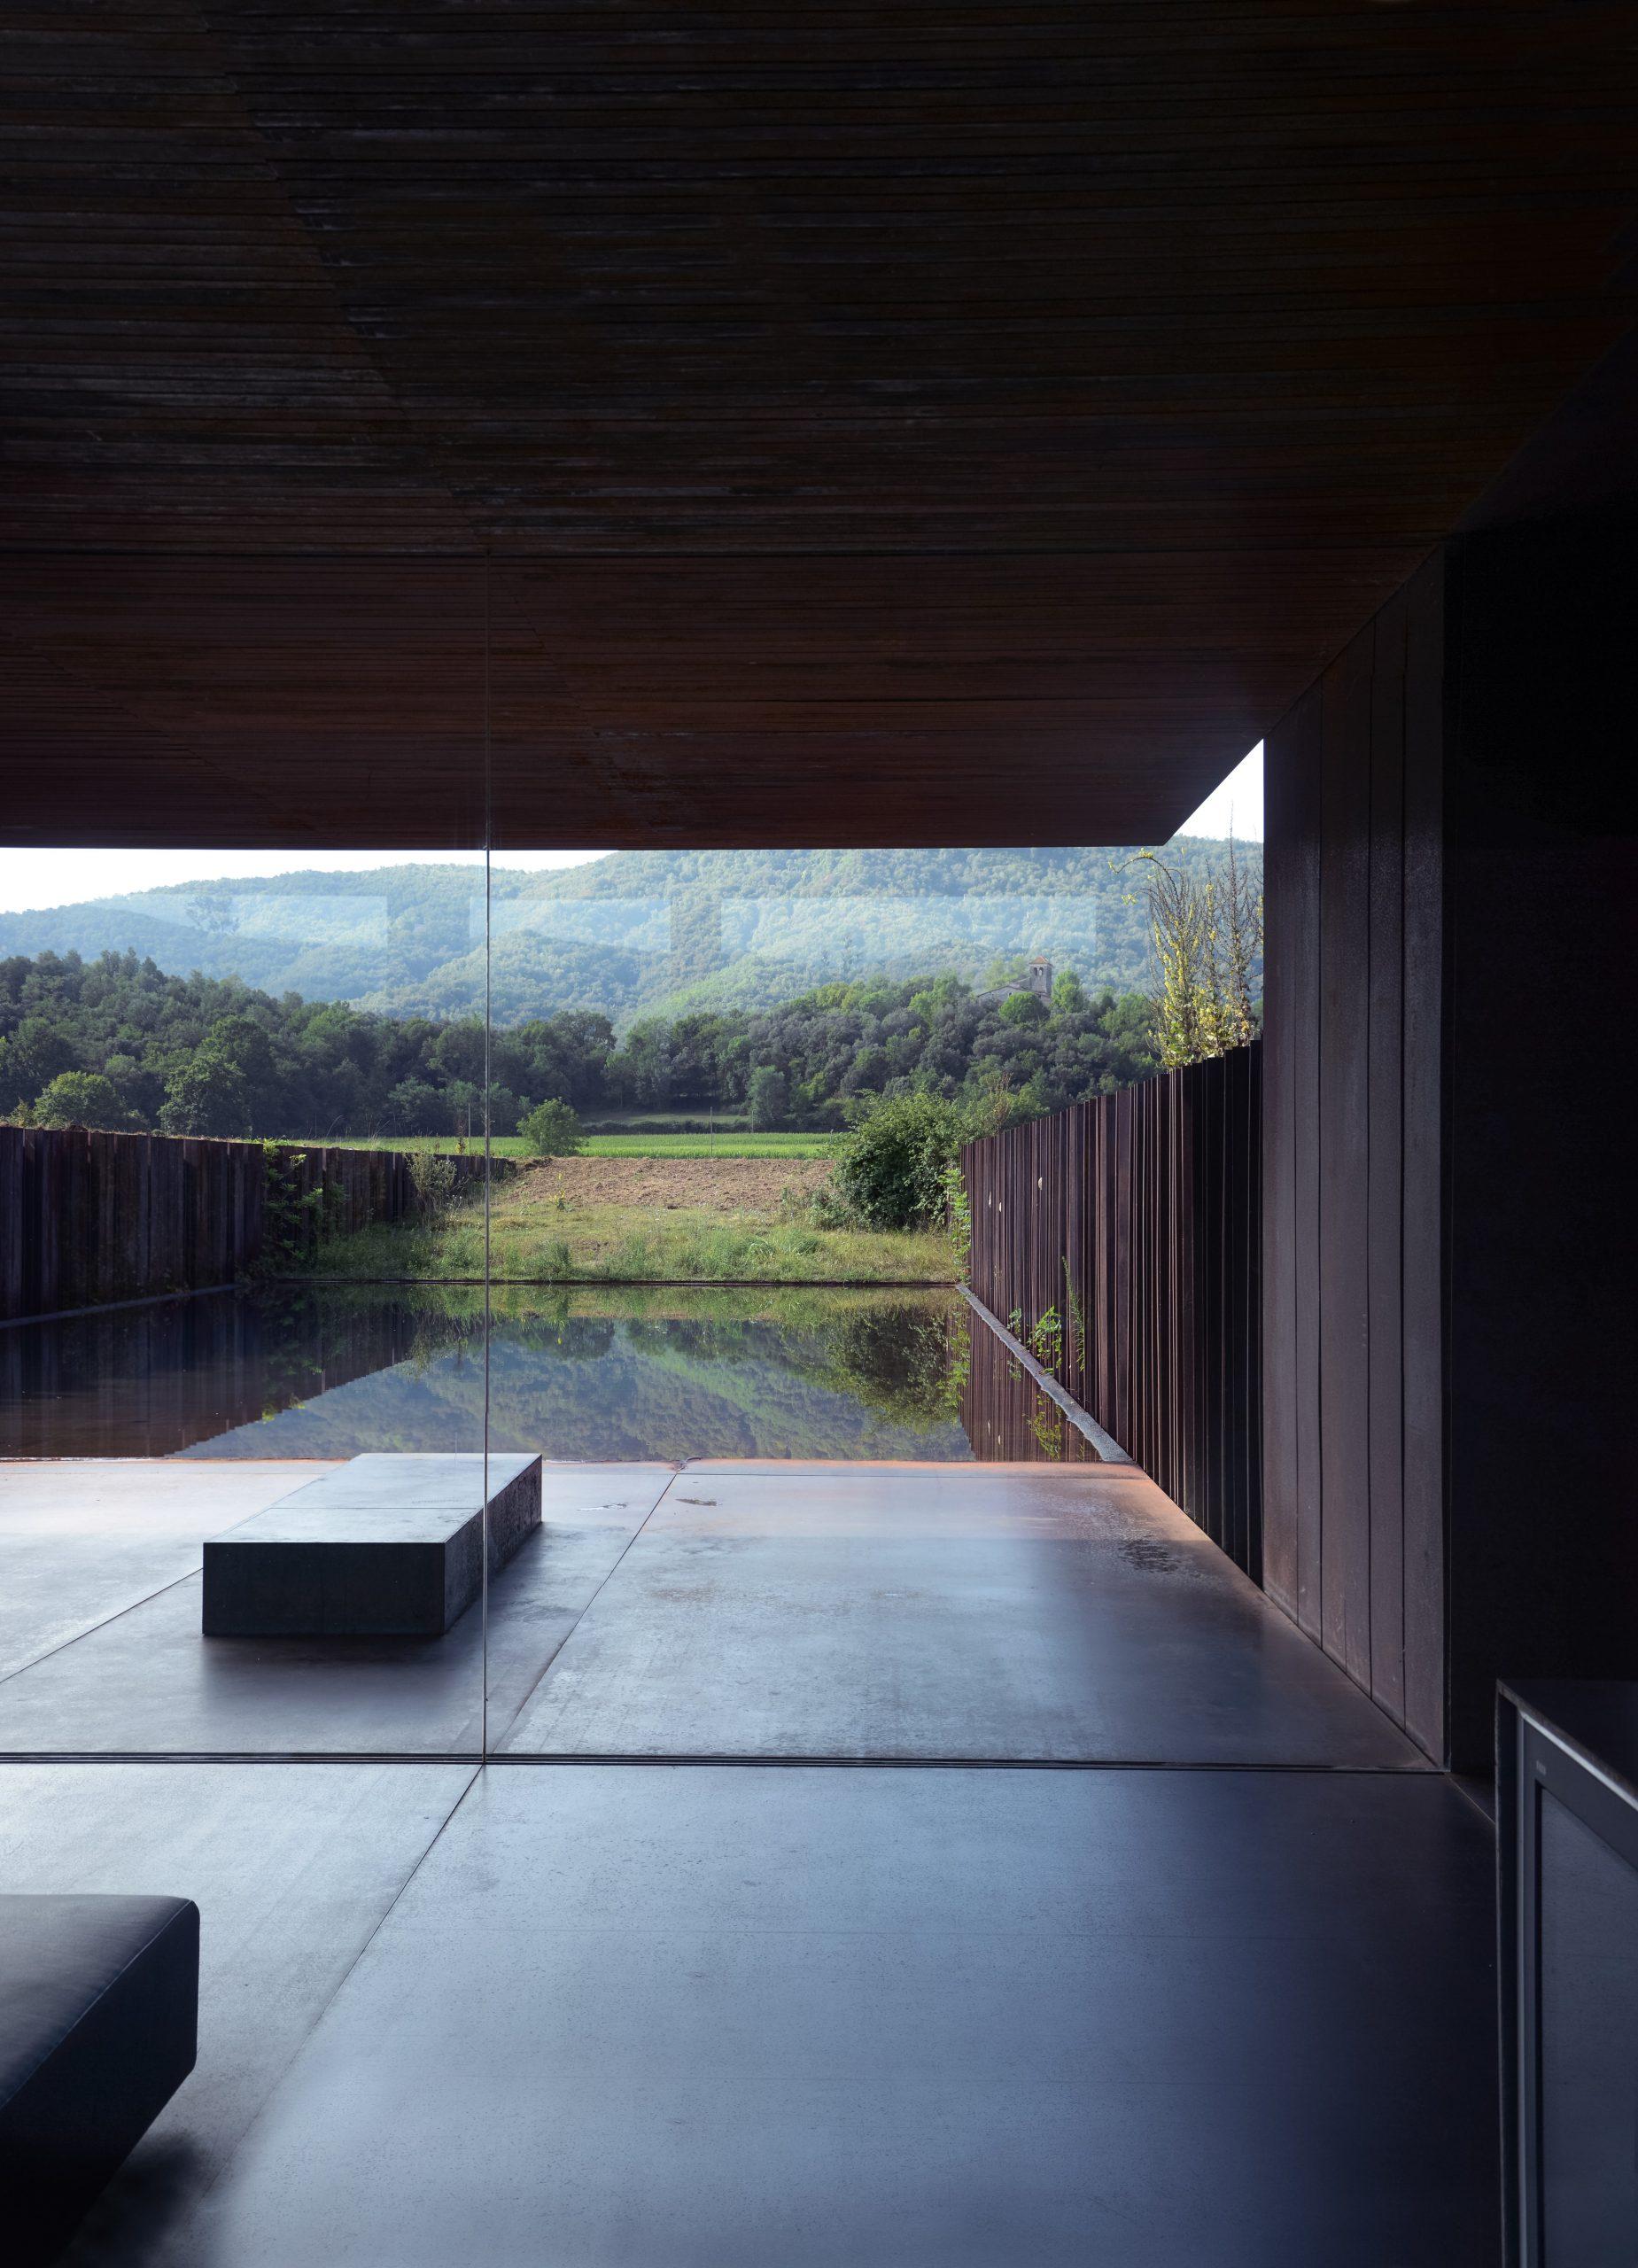 Interior de la Casa Horizontal / Foto: Casa Horizonte del estudio RCR / Foto: Theo Coutanceau-Domini